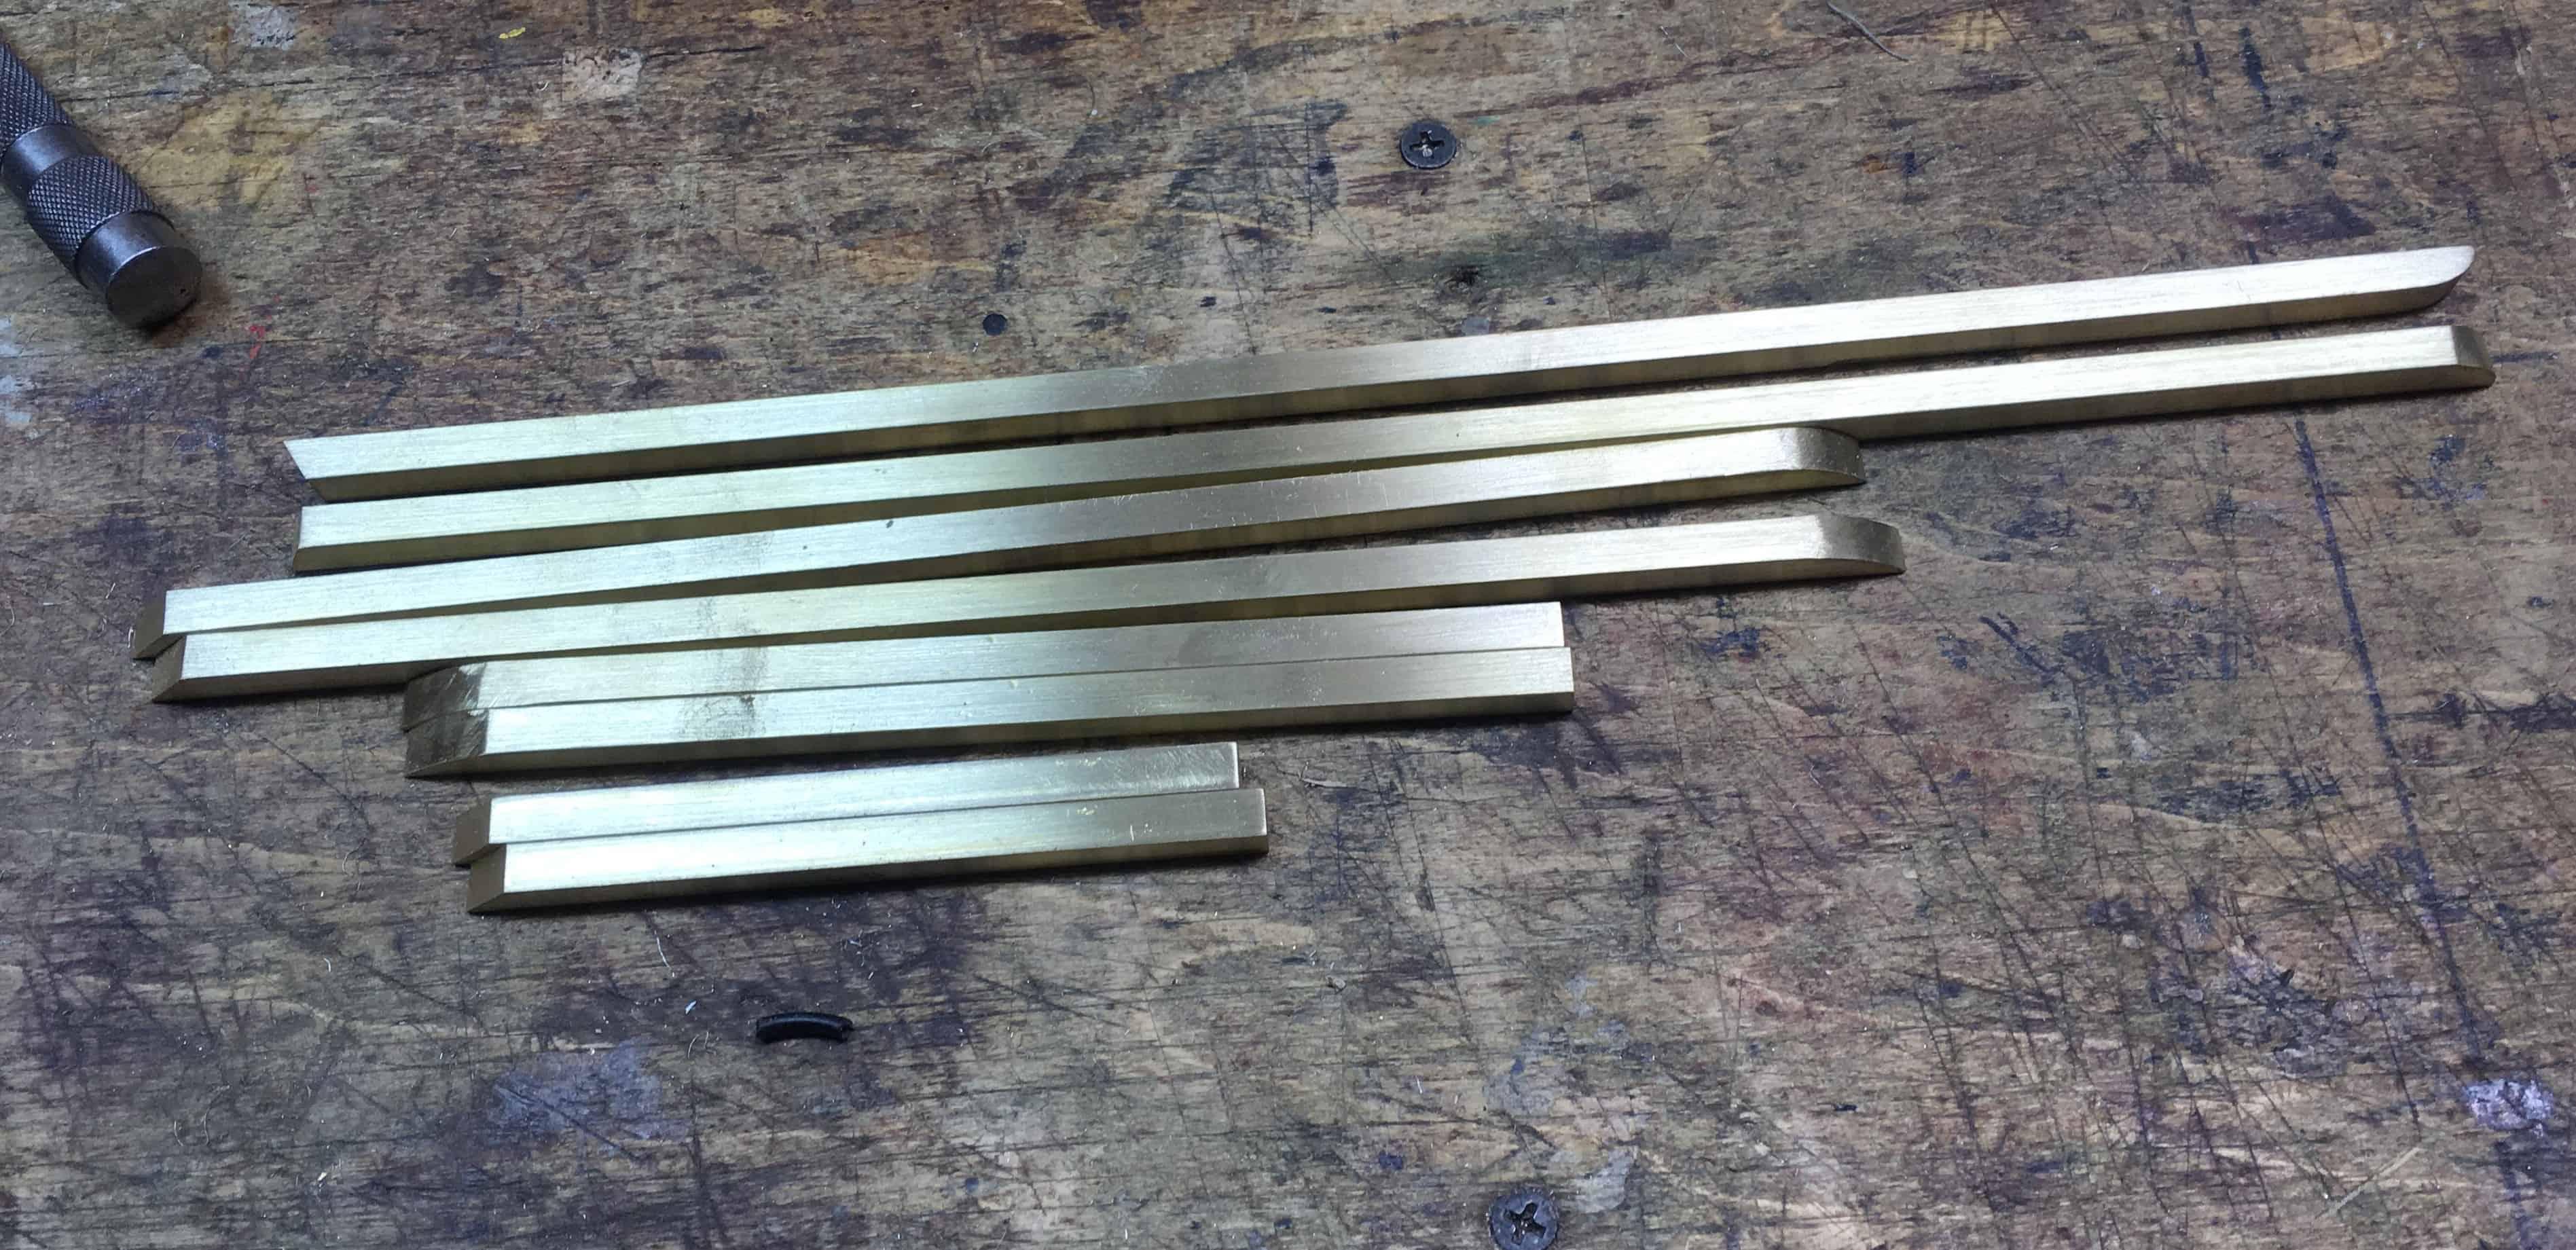 66 Brass cut